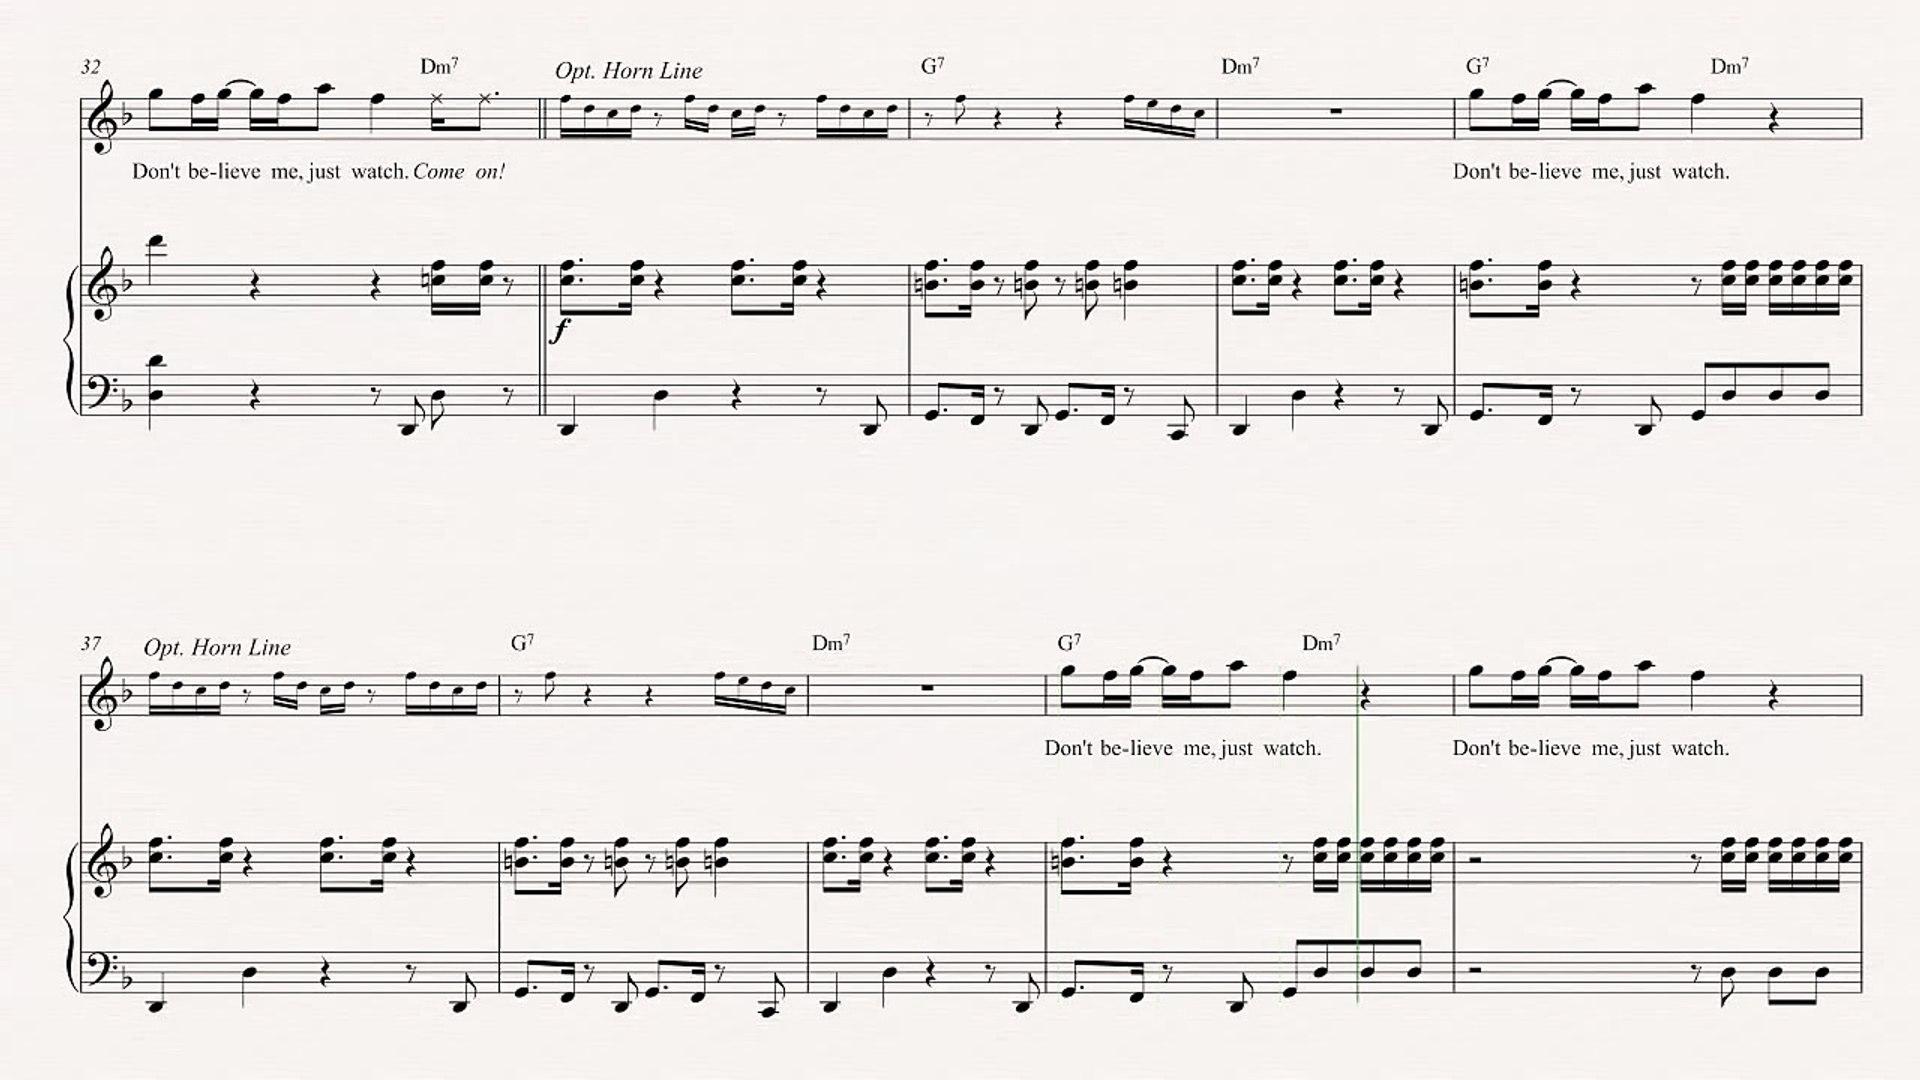 Trumpet Uptown Funk Mark Ronson Sheet Music Chords Vocals